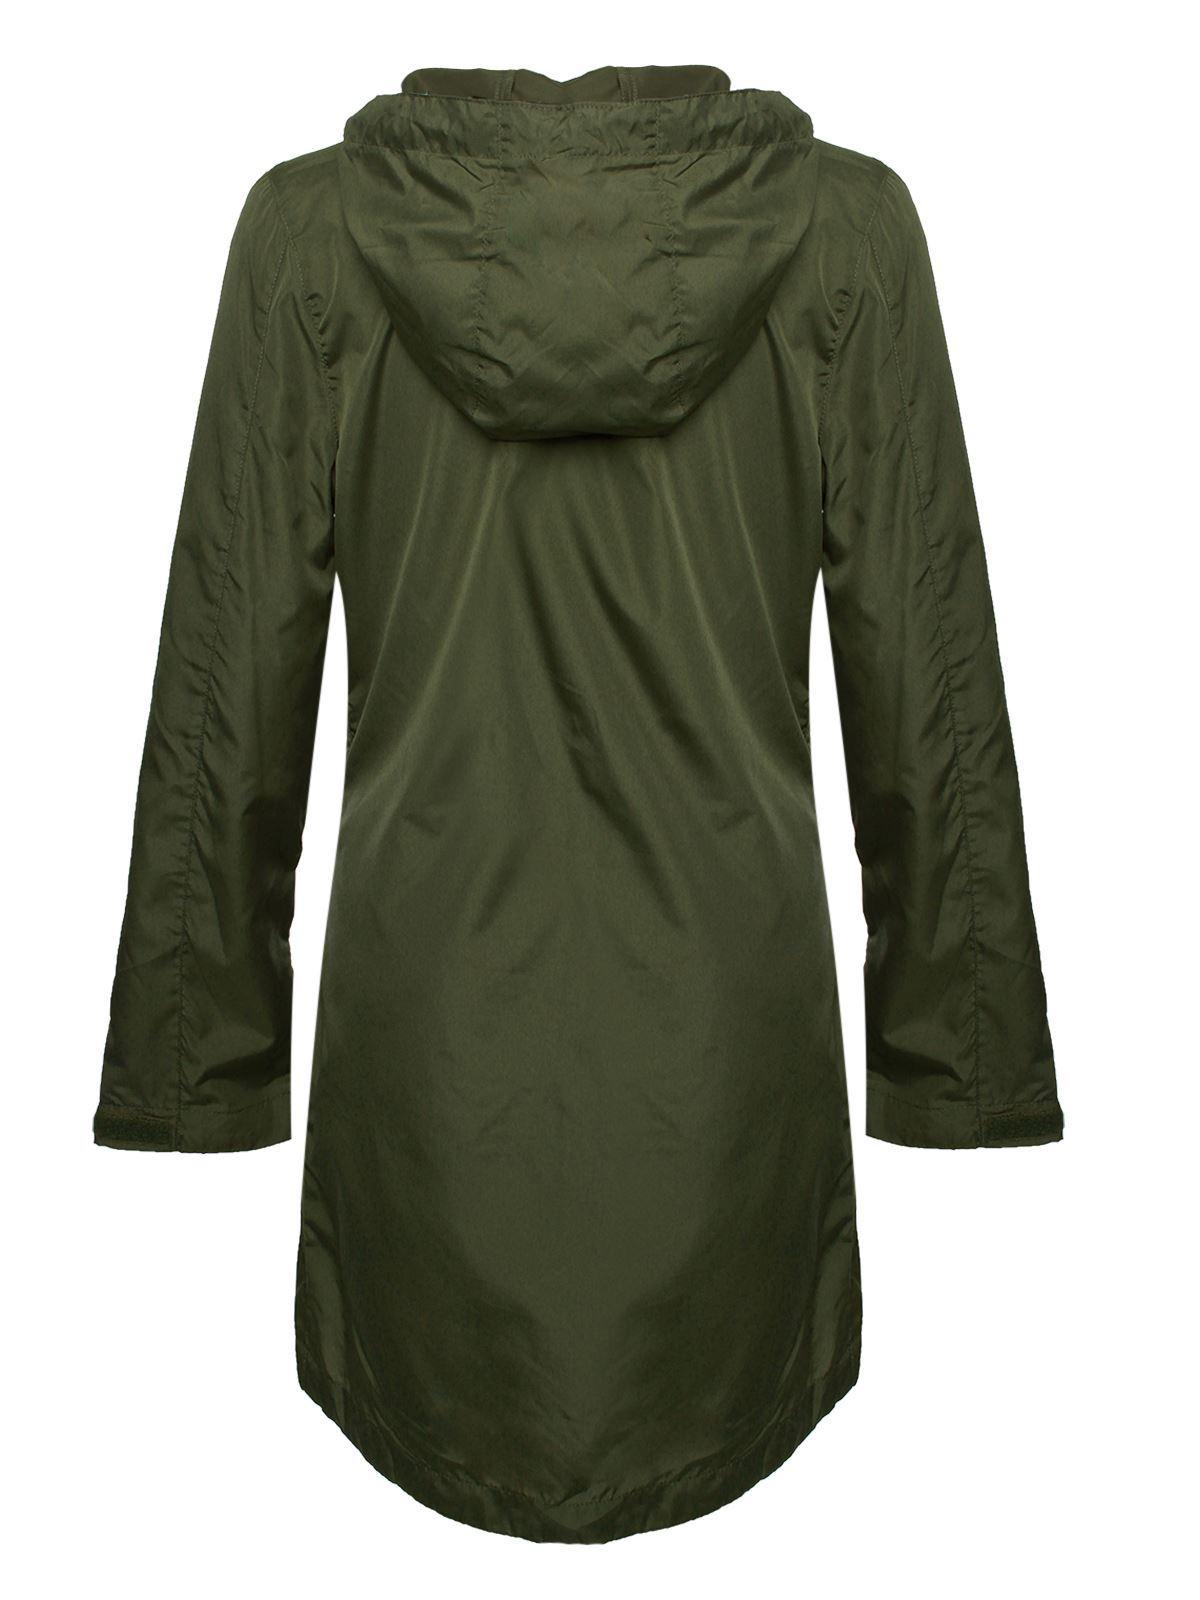 New-Ladies-Womens-Showerproof-Mac-Light-Rain-Jacket-Plus-Sizes thumbnail 5